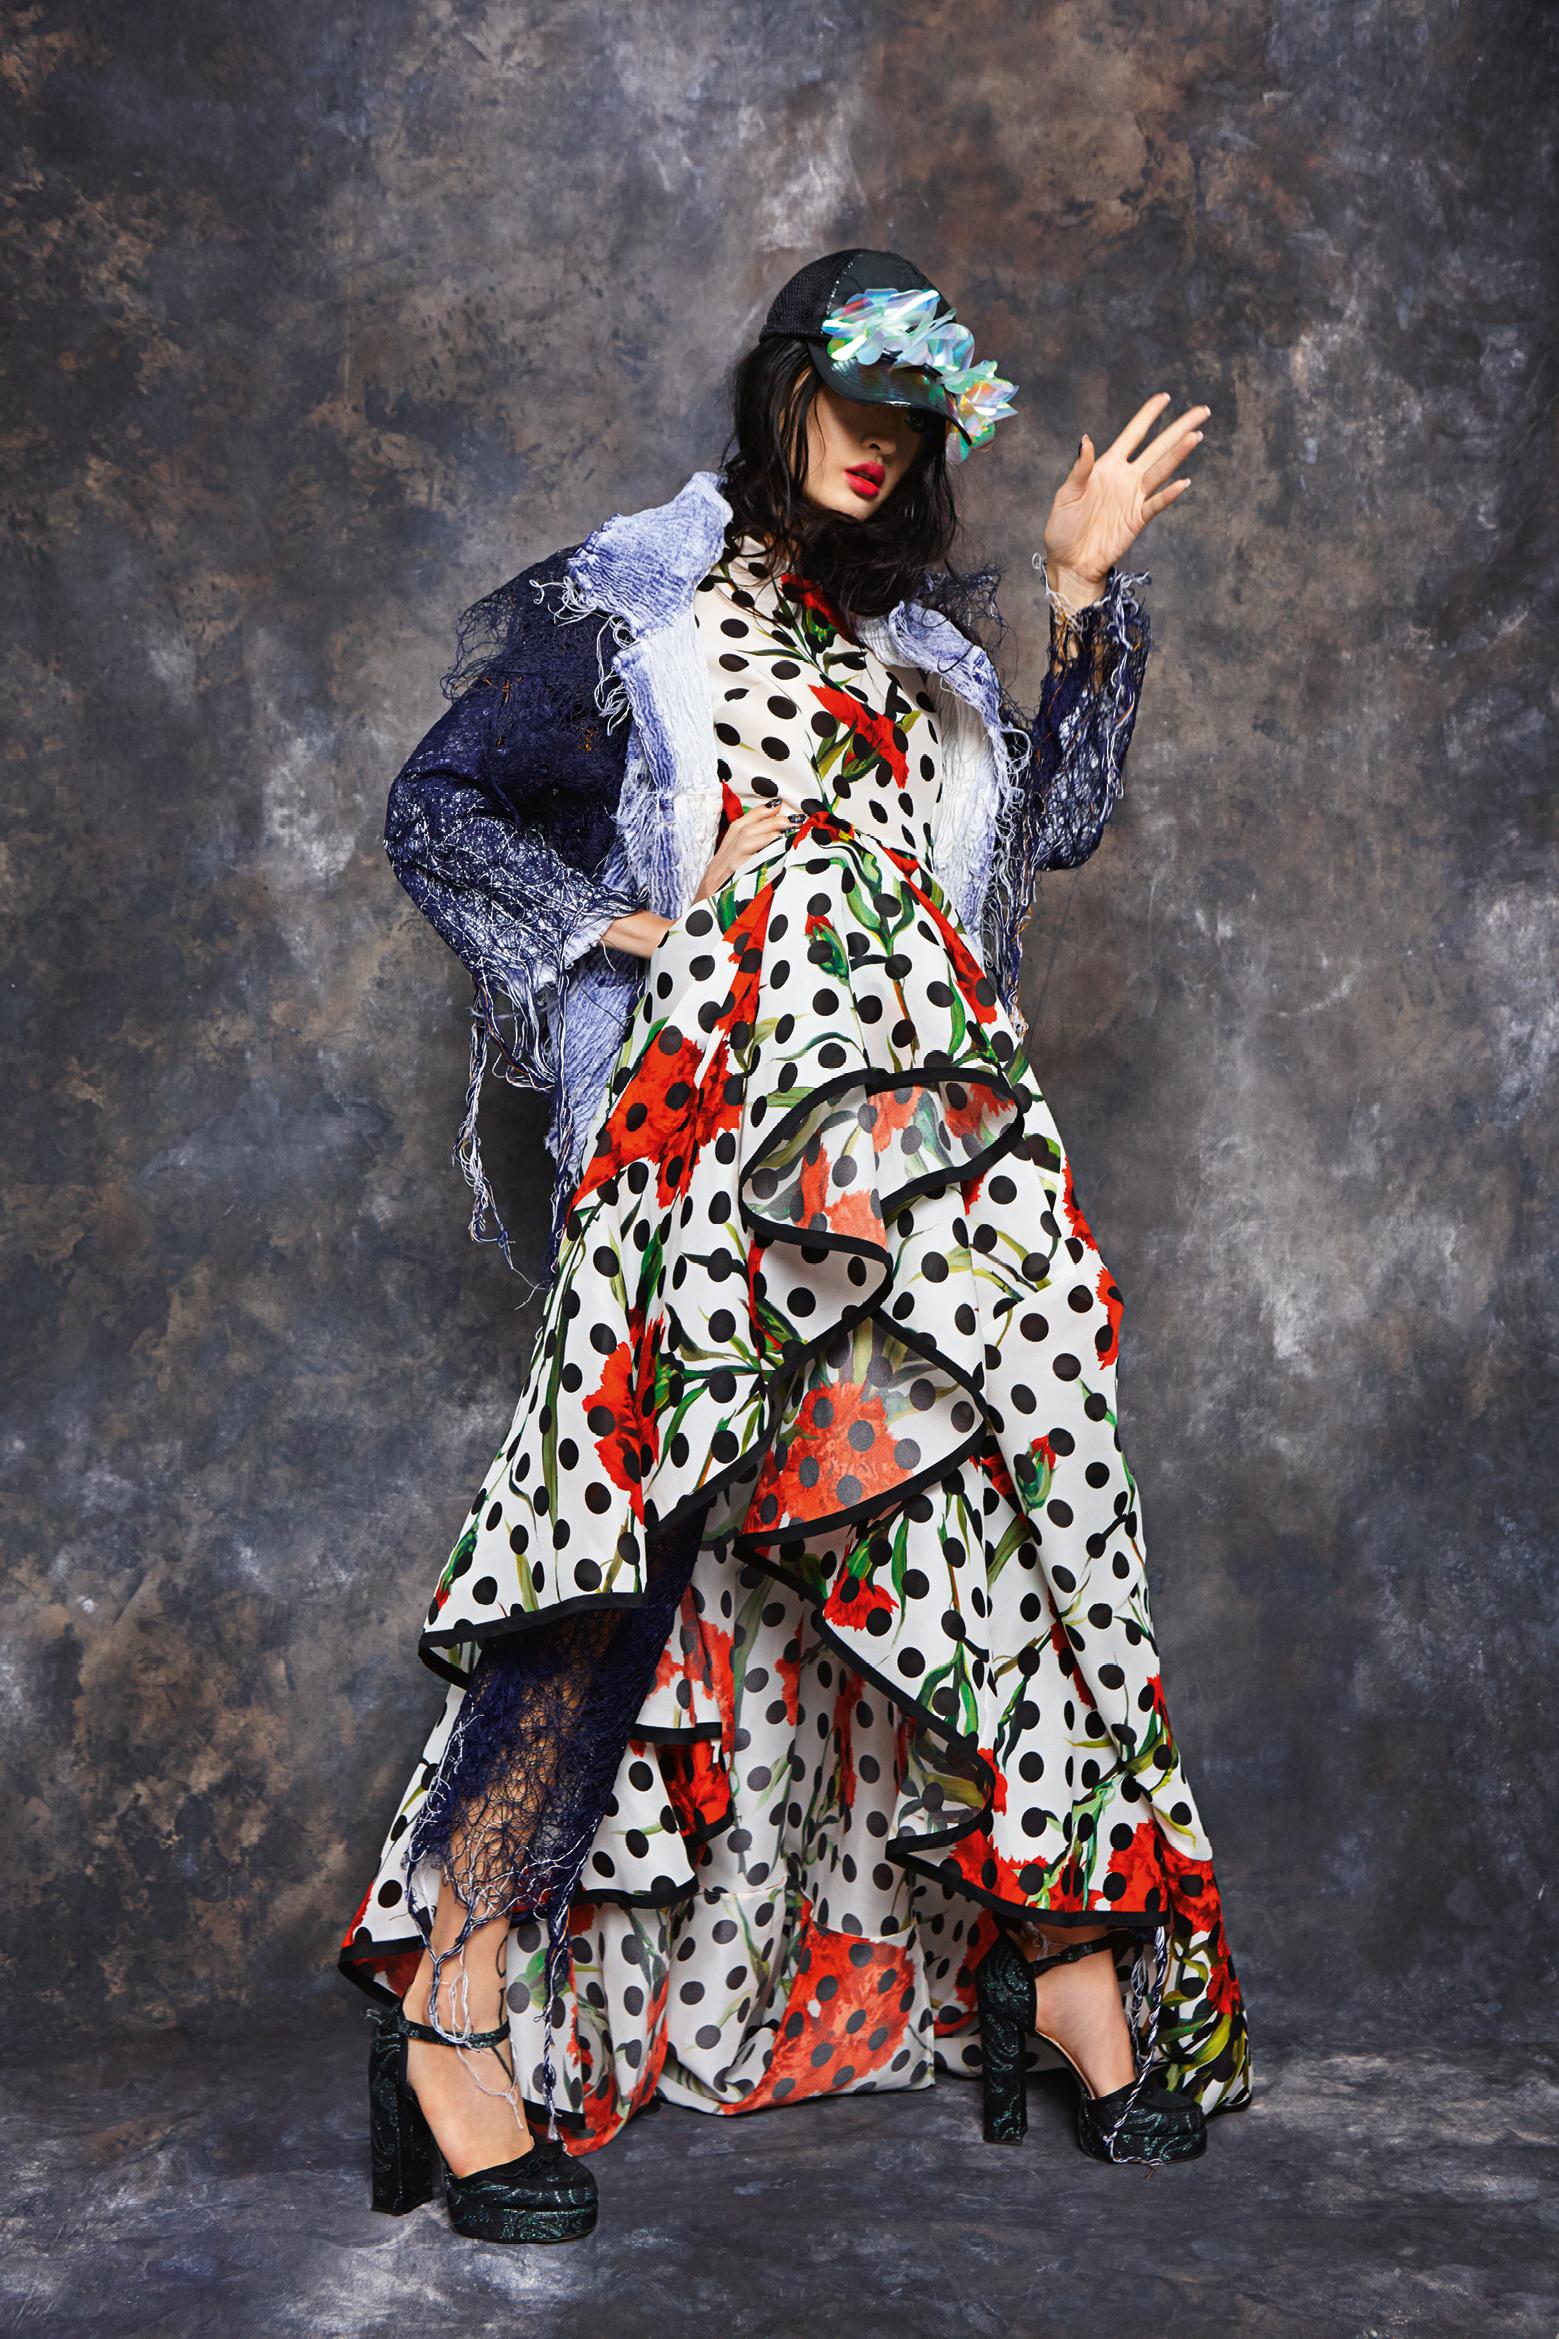 Polka dot frilled floral dress,  Dolce & Gabbana.  Jeans (worn underneath) and shredded denim effect jackets (worn over), all  Faustine Steinmetz.  Cap,  Fyodor Golan.  Head-dress,  Pebble London.  Shoes,  Micheal Van der Ham.